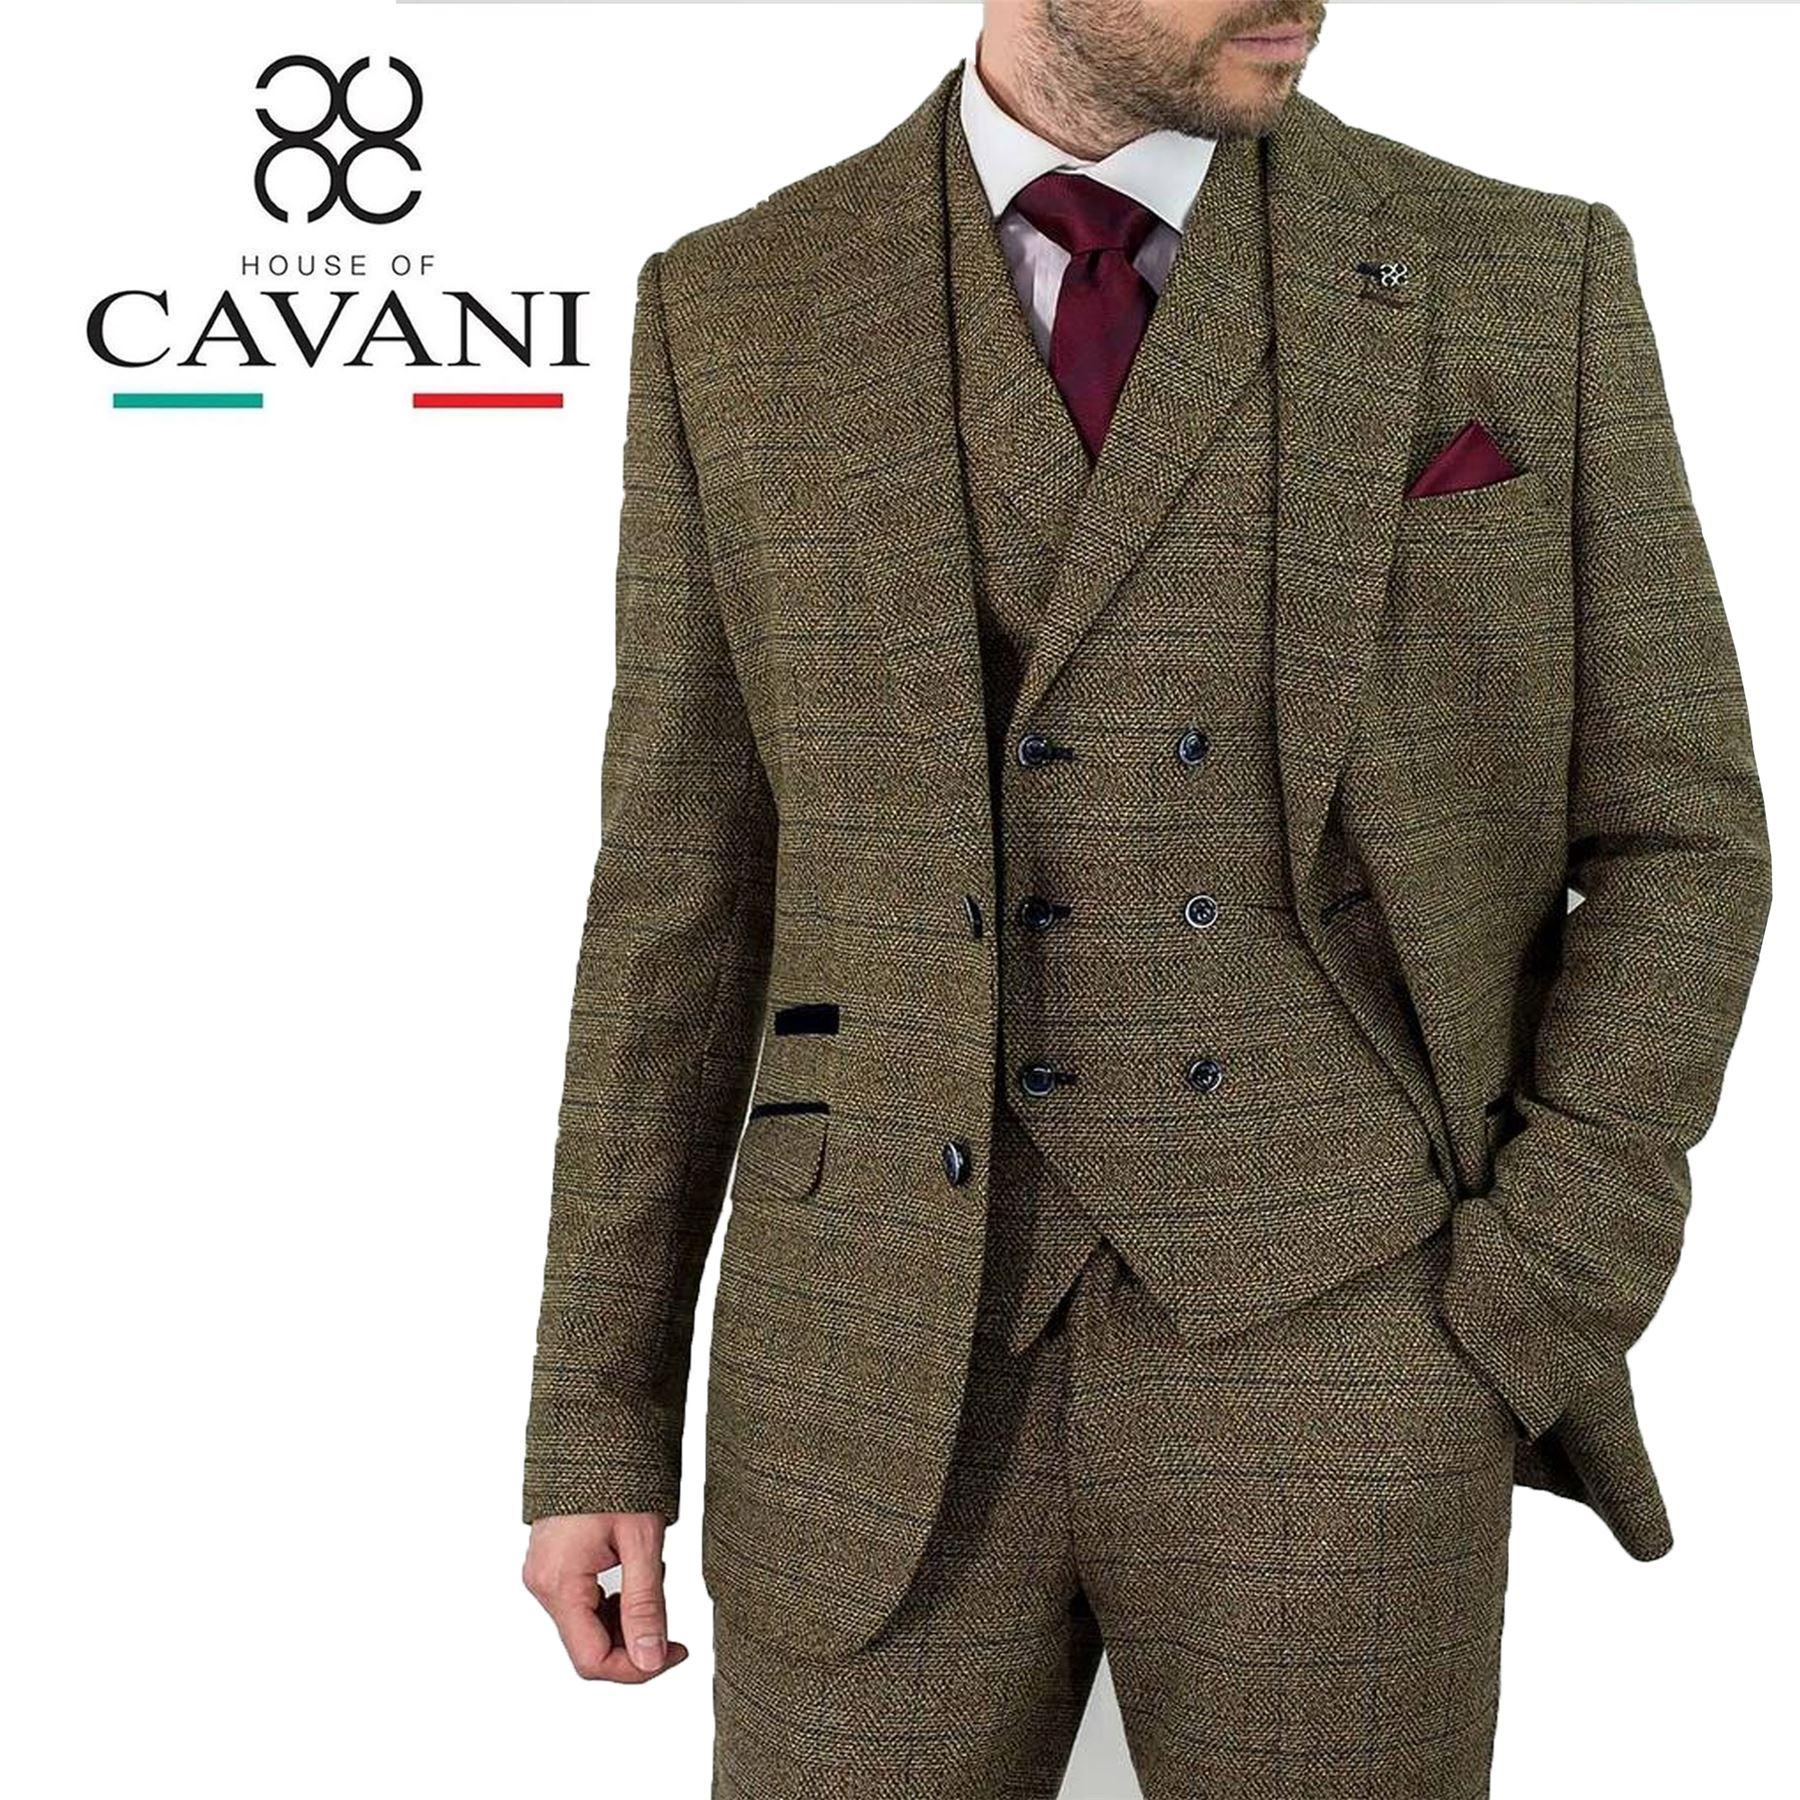 CAVANI Sergio Tan Tweed Carreaux Pantalon